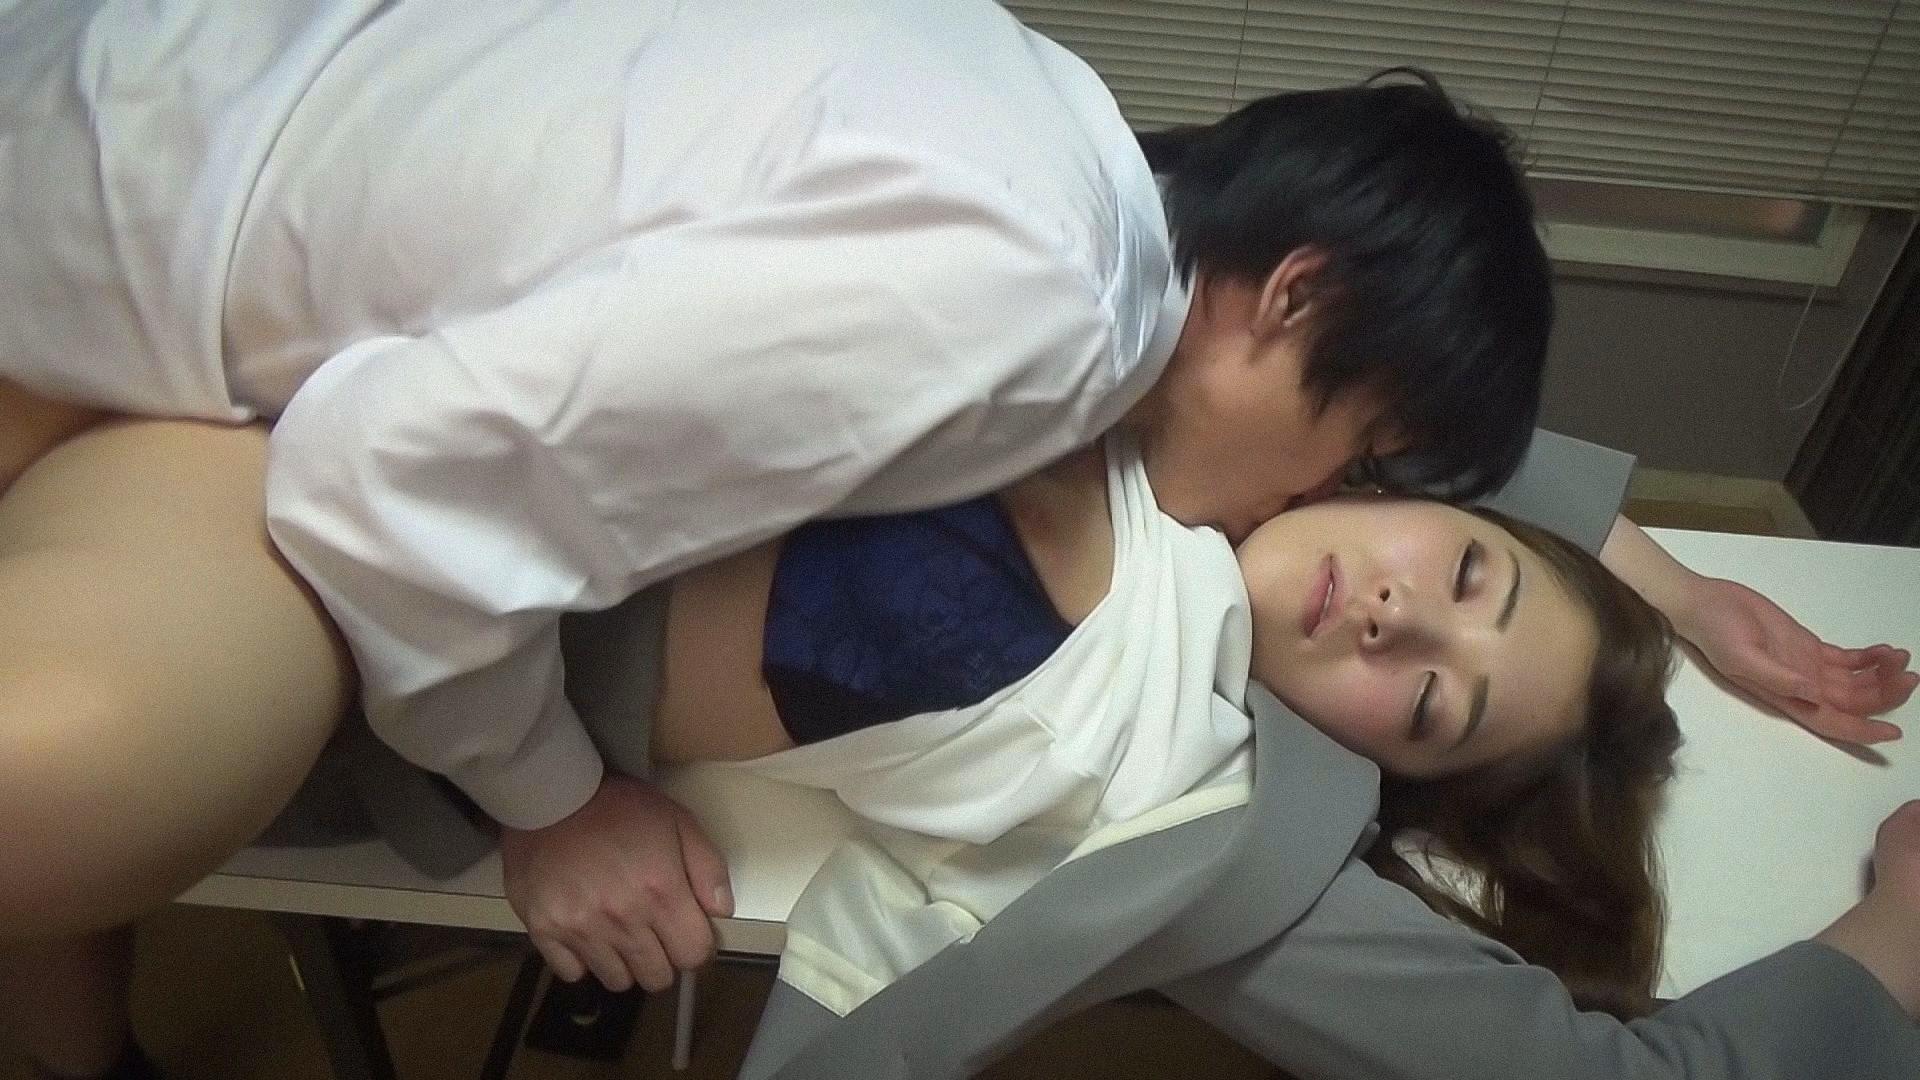 【CASE#1】就活面接に来た女子大生に睡〇薬入りのお茶を出した結果...!? 画像4